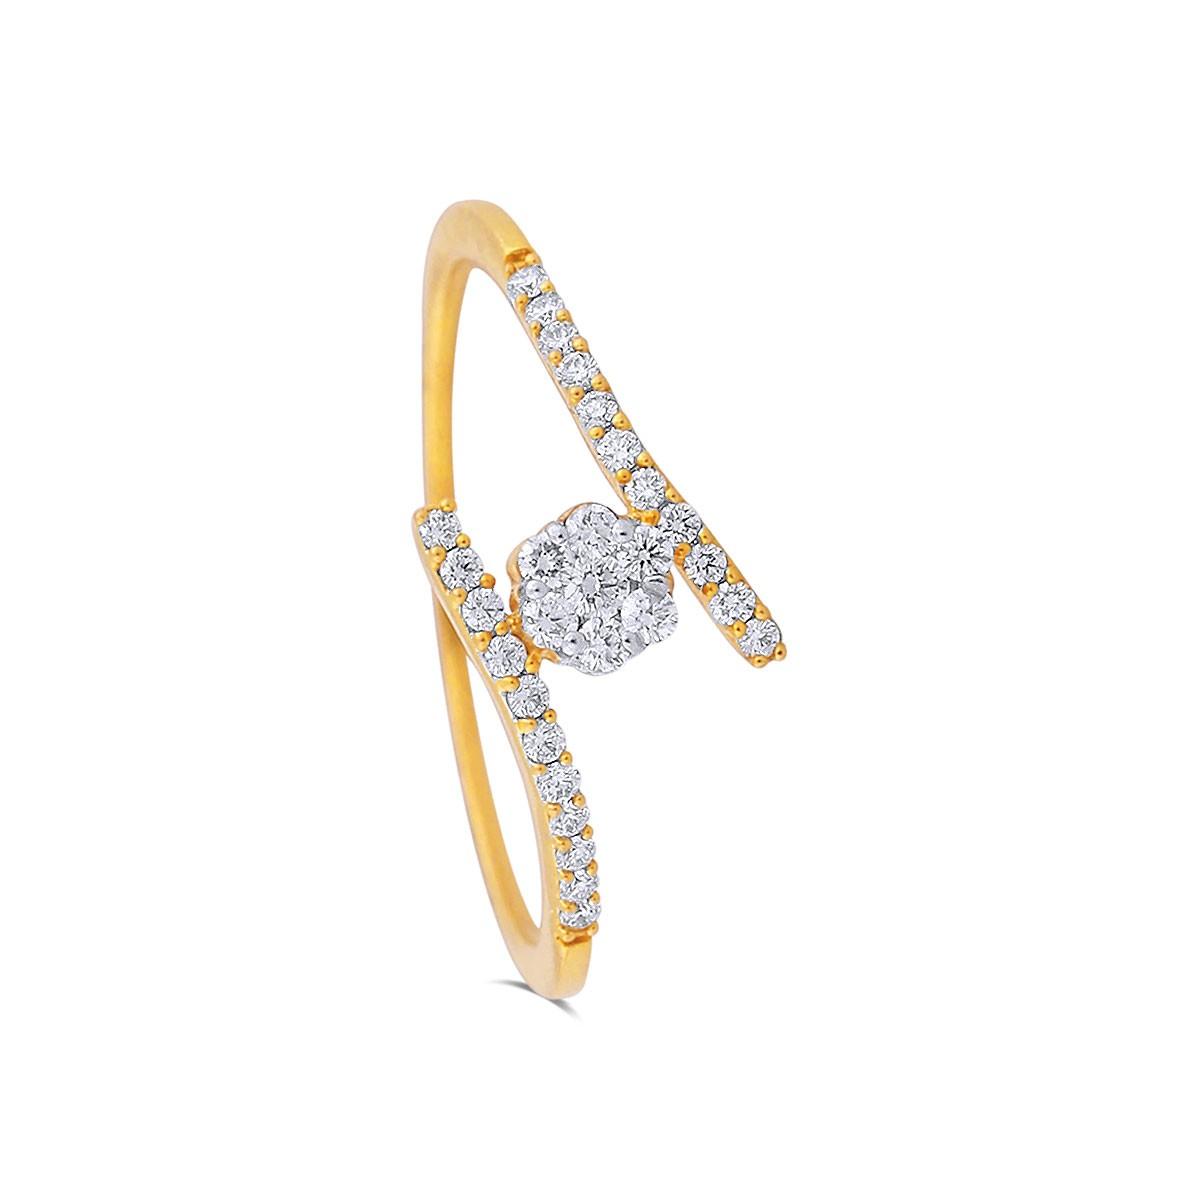 Olva Yellow Gold Diamond Ring